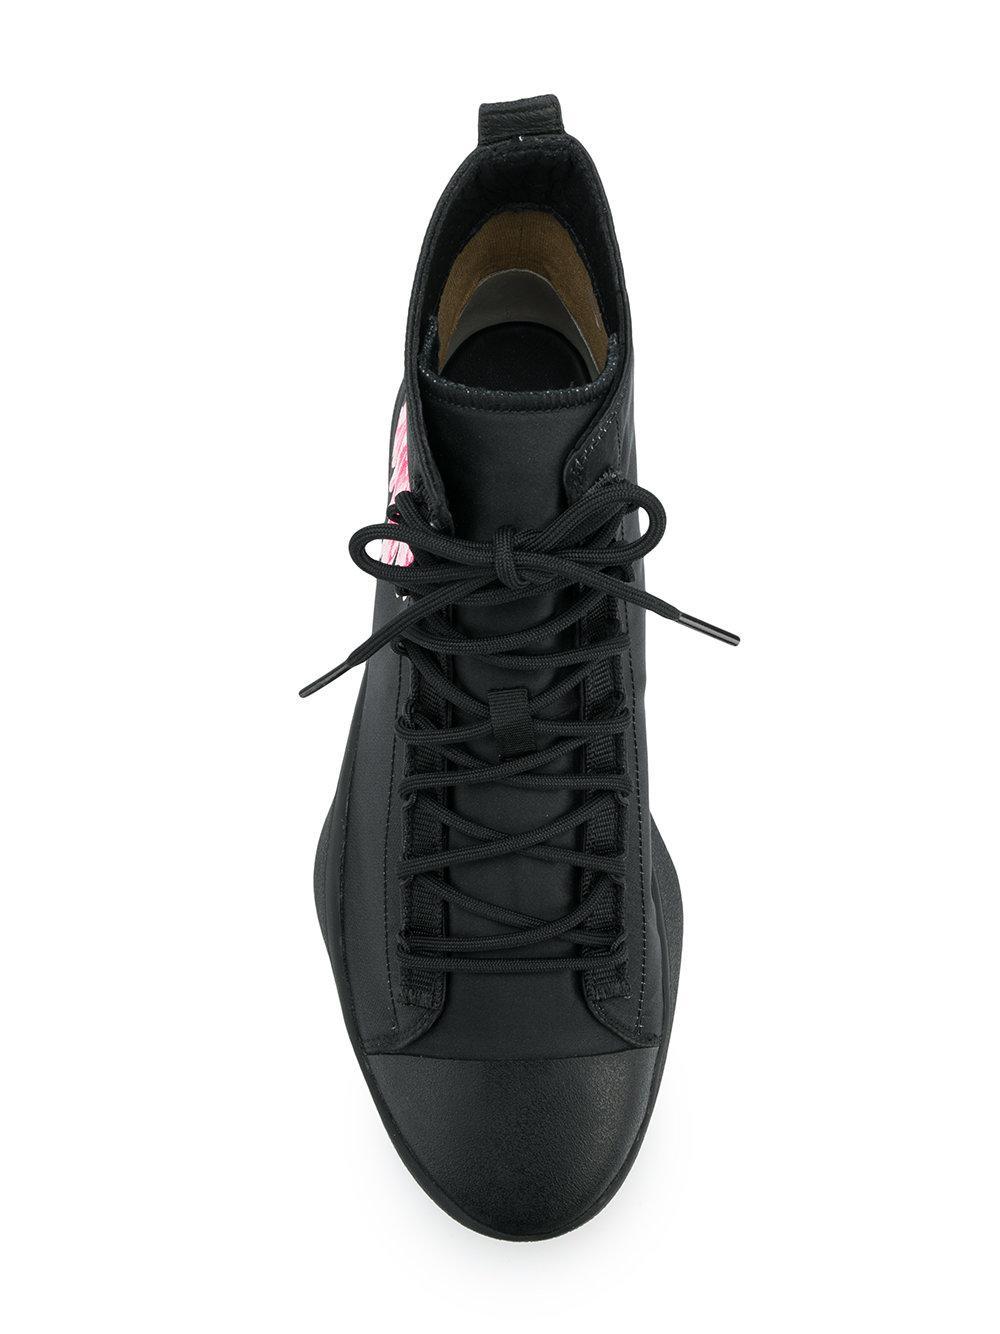 6aab6365931 Lyst - Y-3 X James Harden Floral Hi-top Sneakers in Black